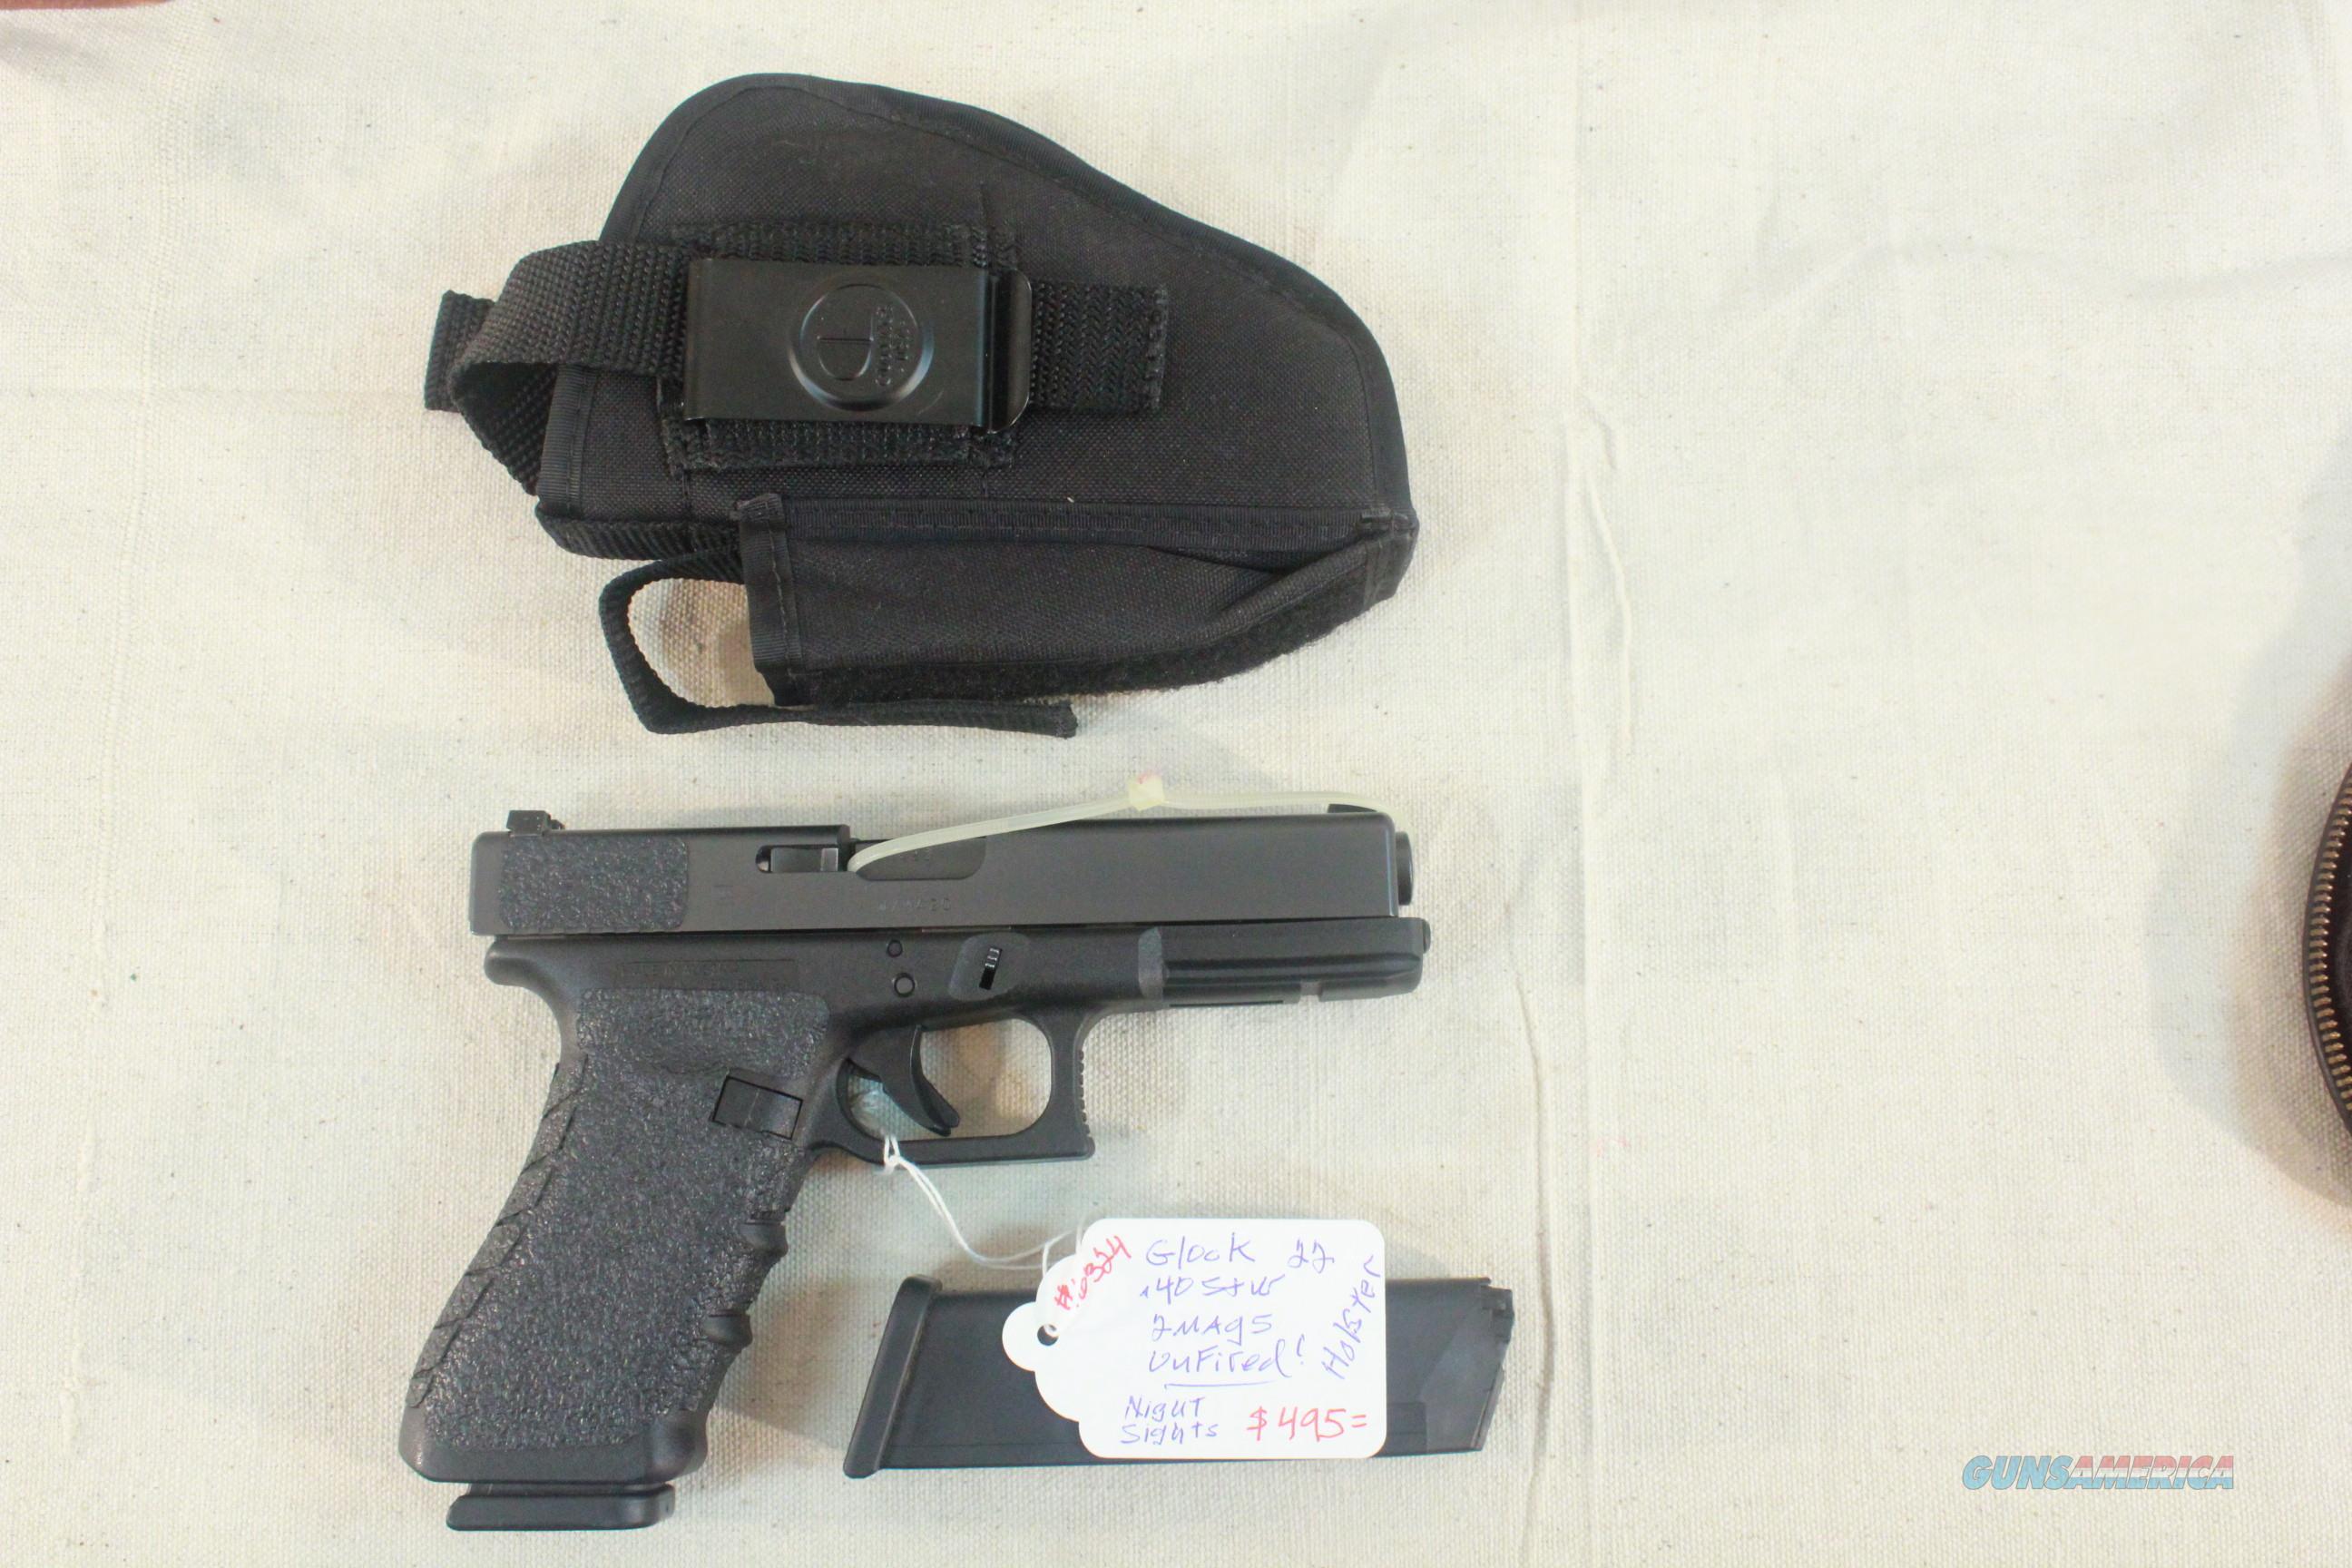 Glock Model 22 .40 S&W with 2 magazines and holster.  Guns > Pistols > Glock Pistols > 22